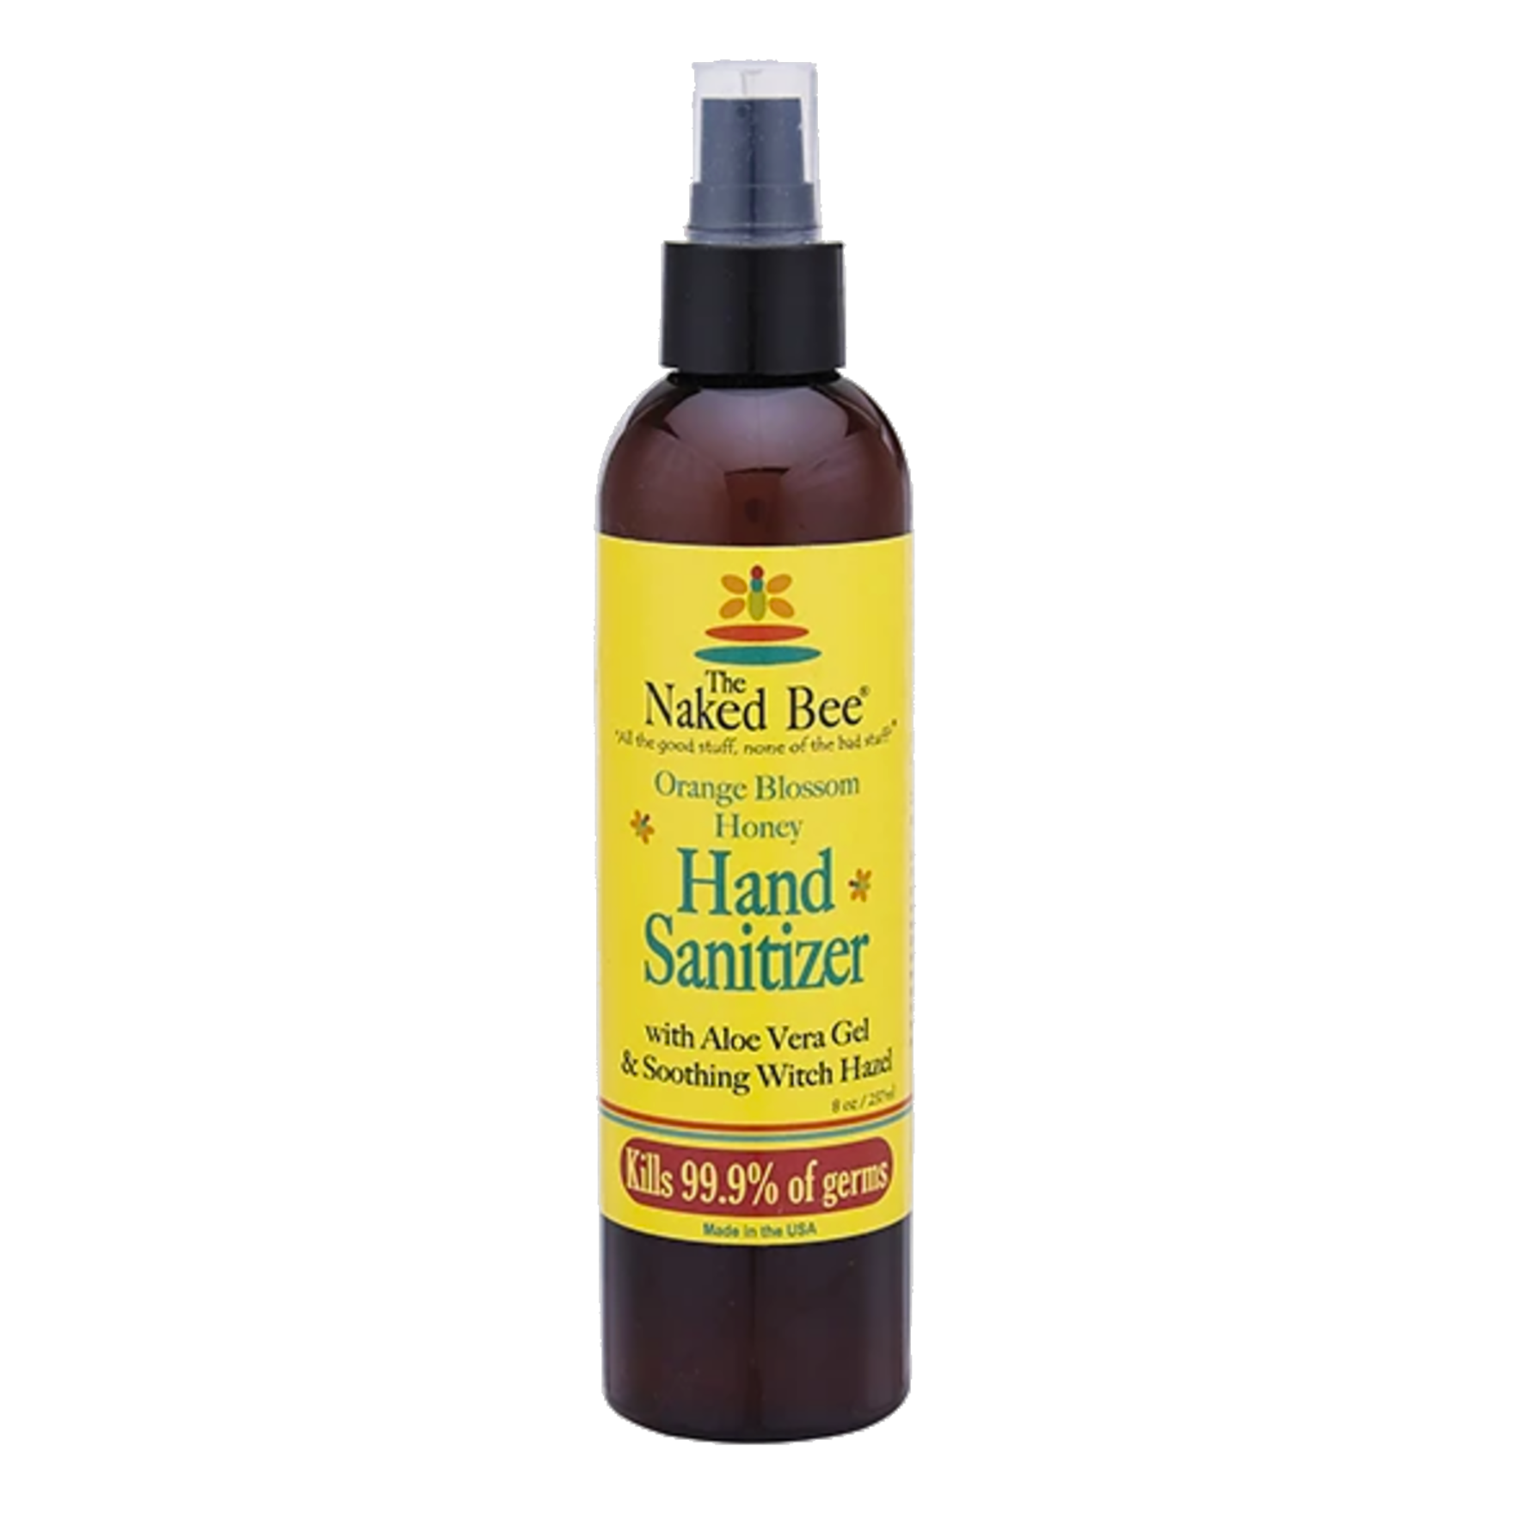 Orange Blossom Honey Hand Sanitizer Pump Bottle, 8 oz.-1